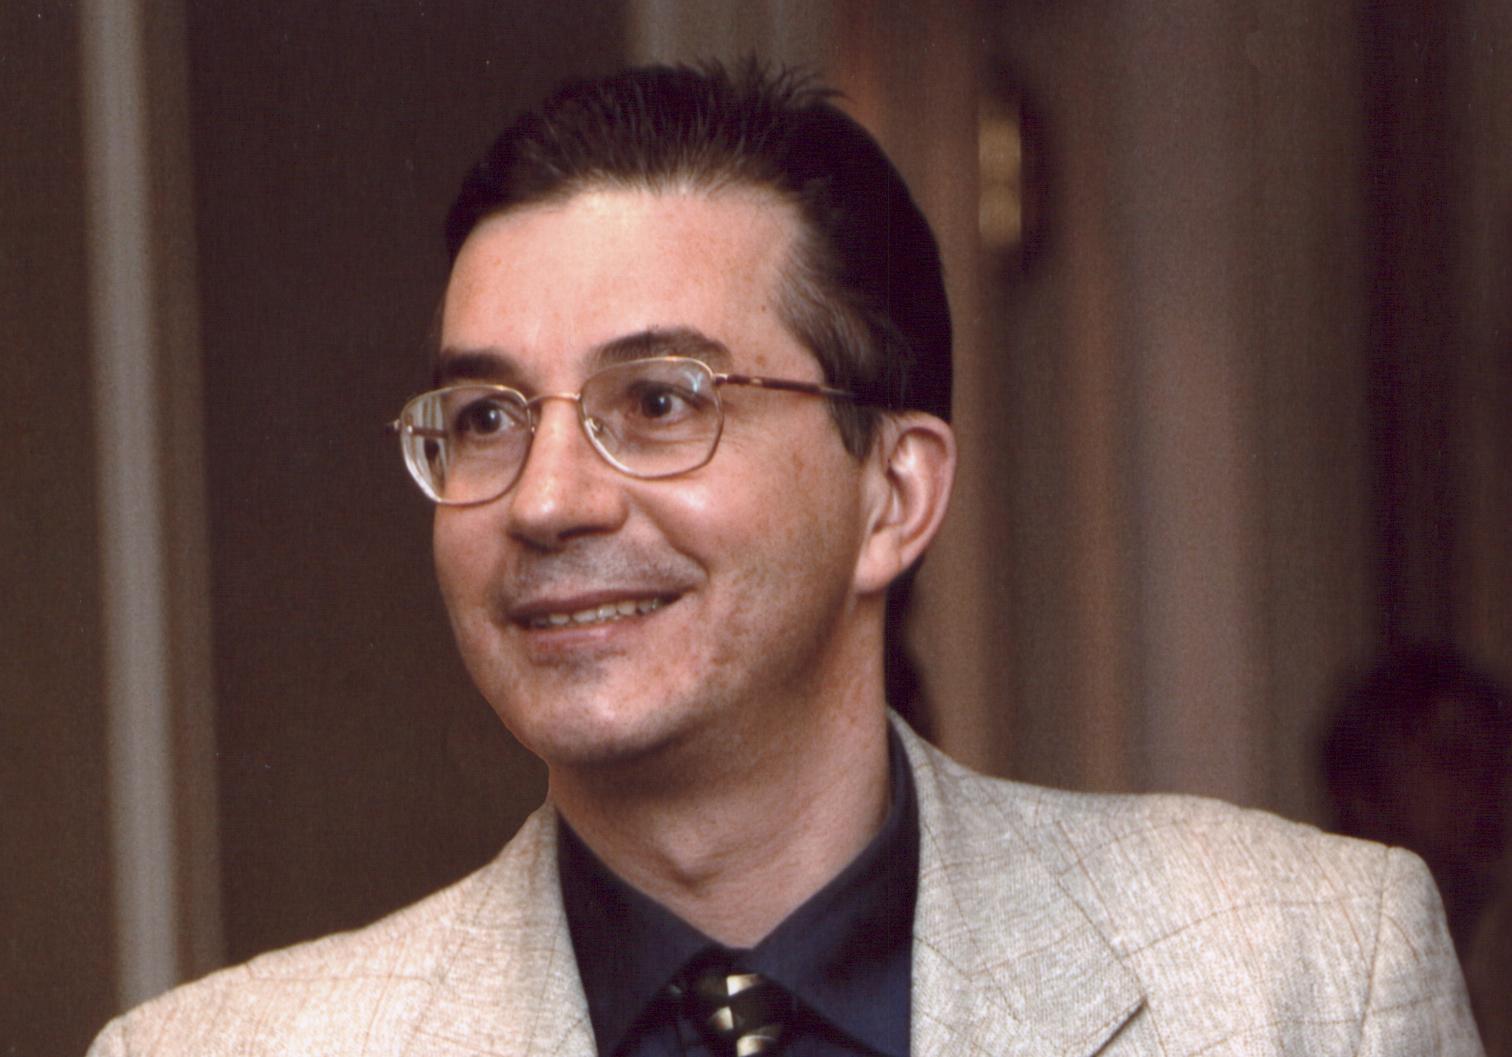 Leonid Rezetdinov